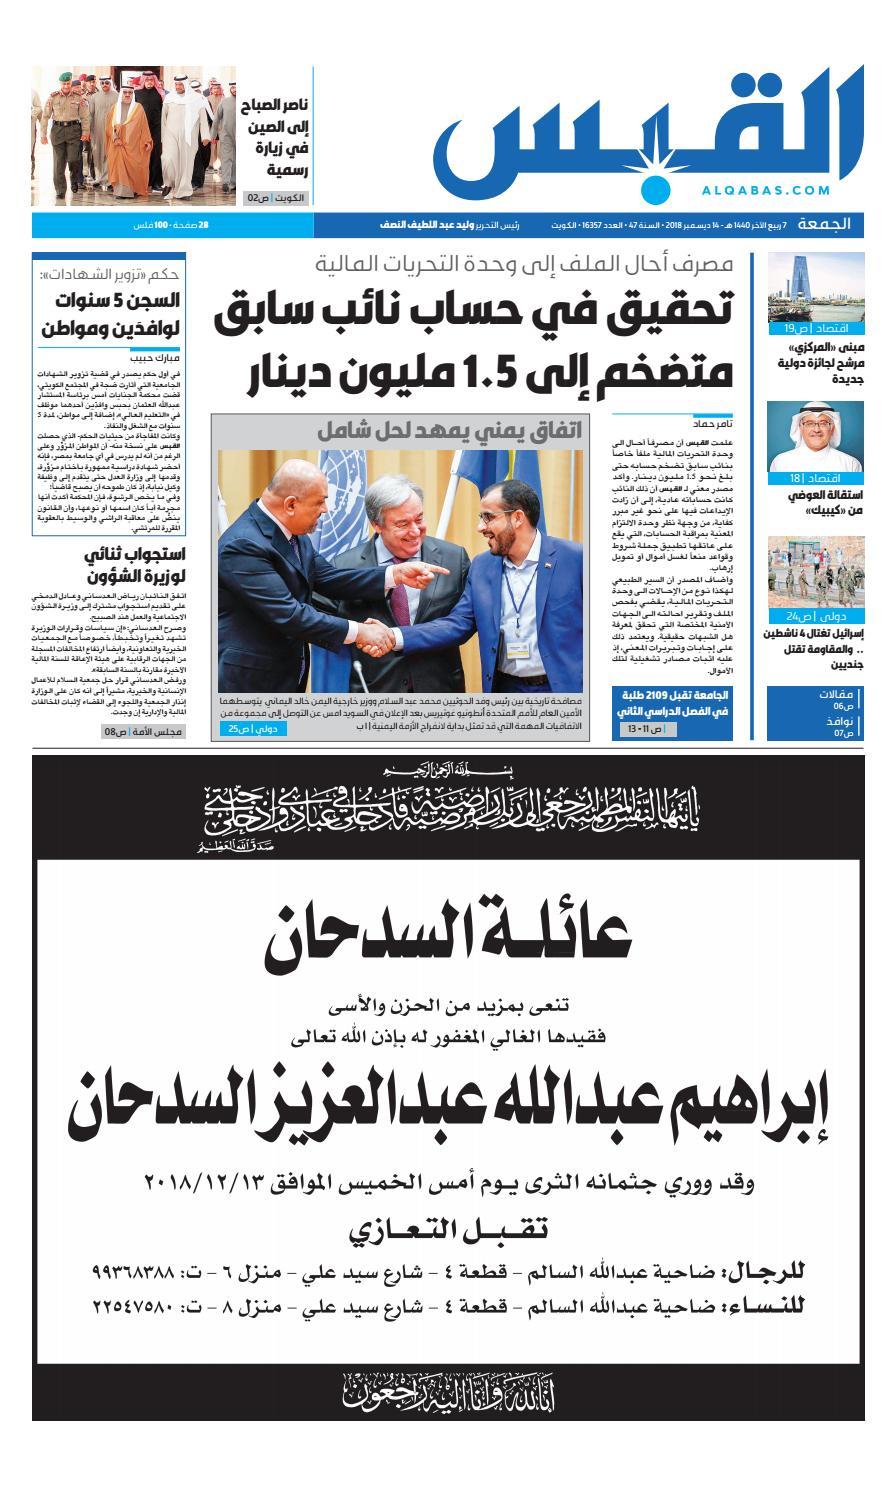 99dd5e427 القبس عدد الجمعة 14 ديسمبر 2018 by AlQabas - issuu